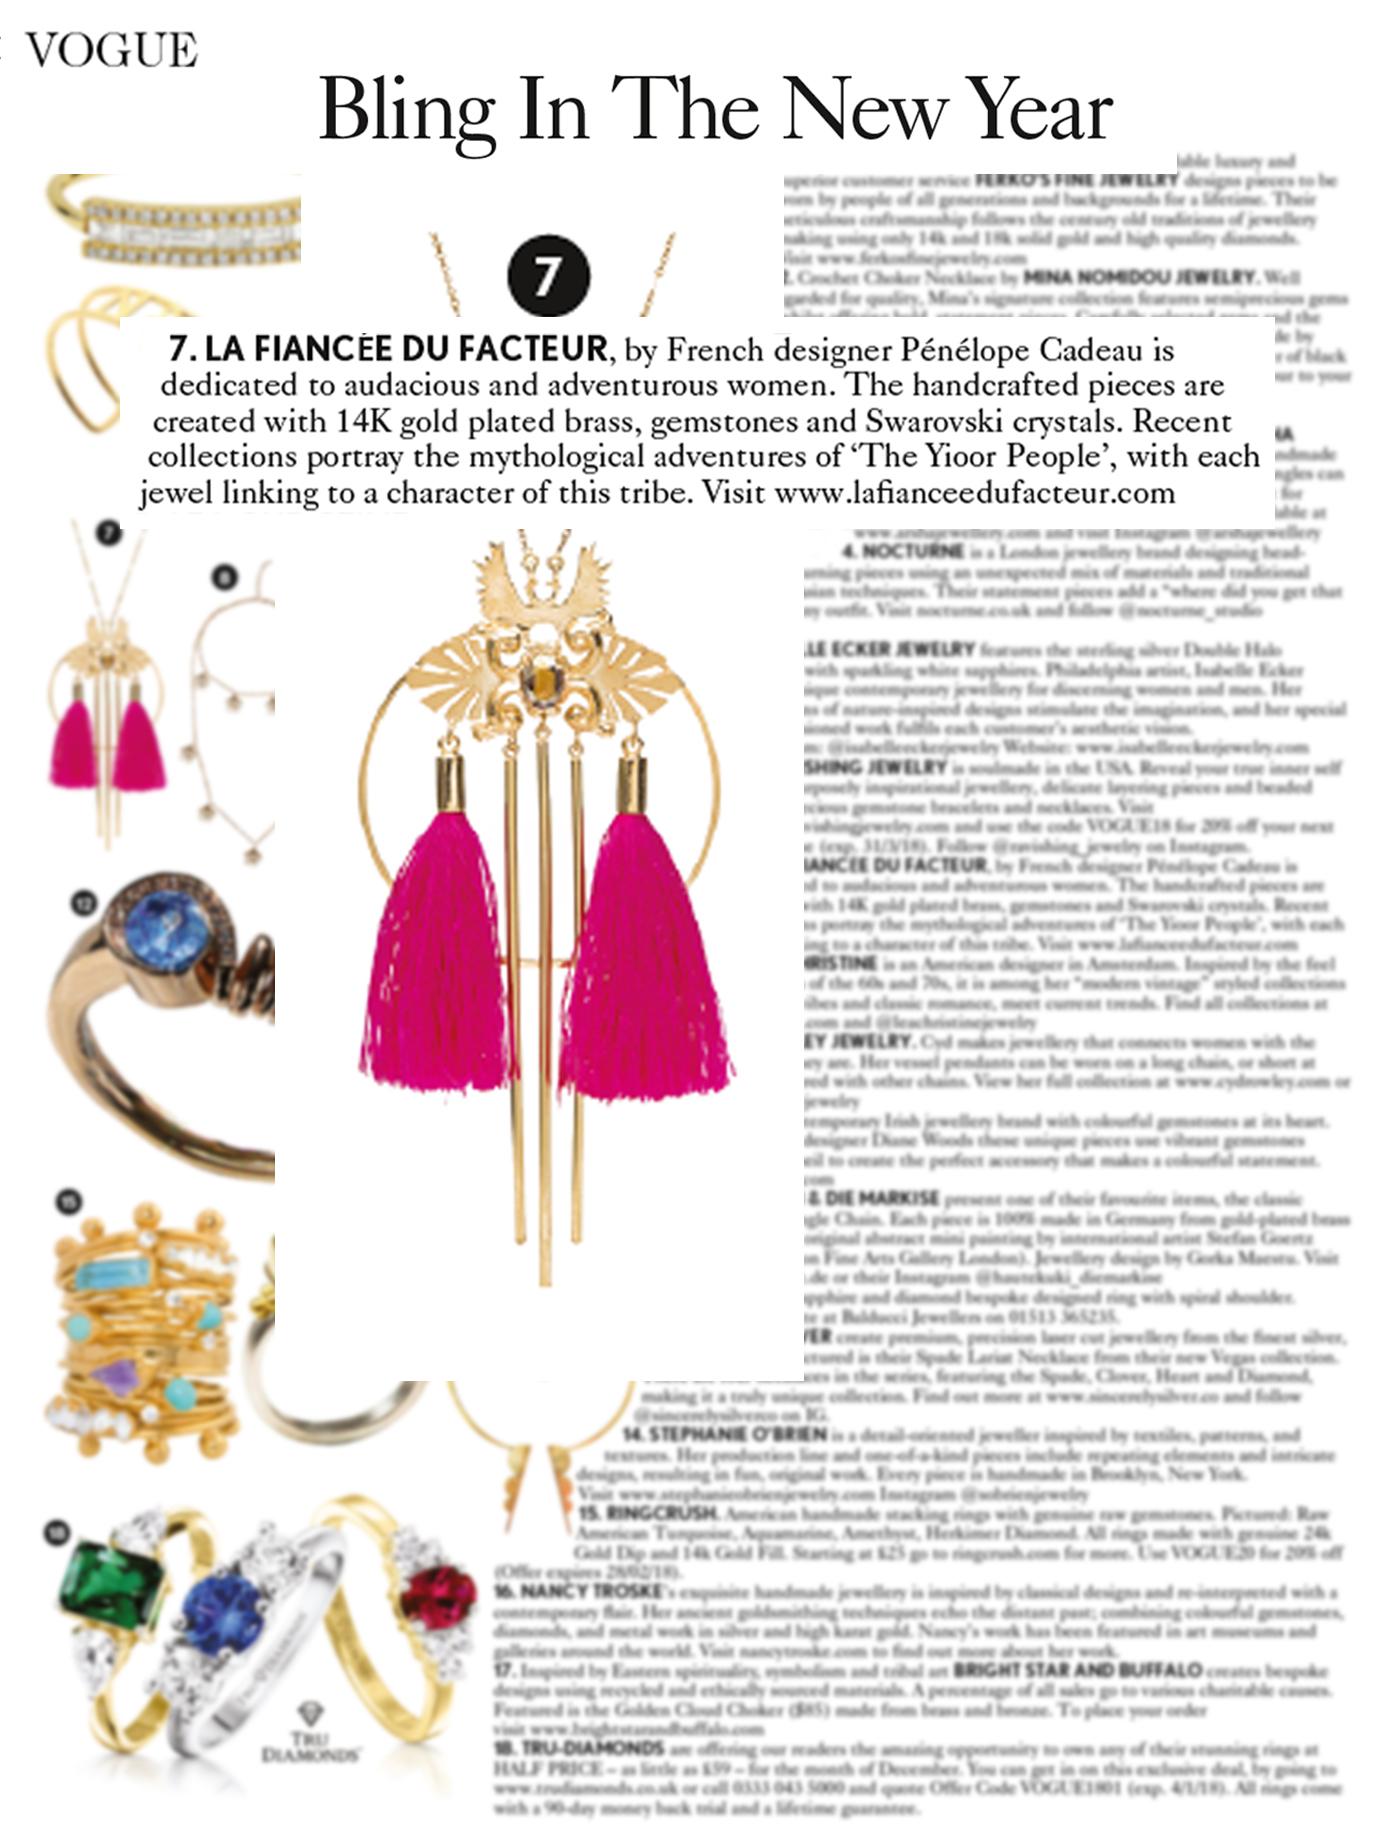 Nanjiy Necklace, 2018 collection (Vogue UK)